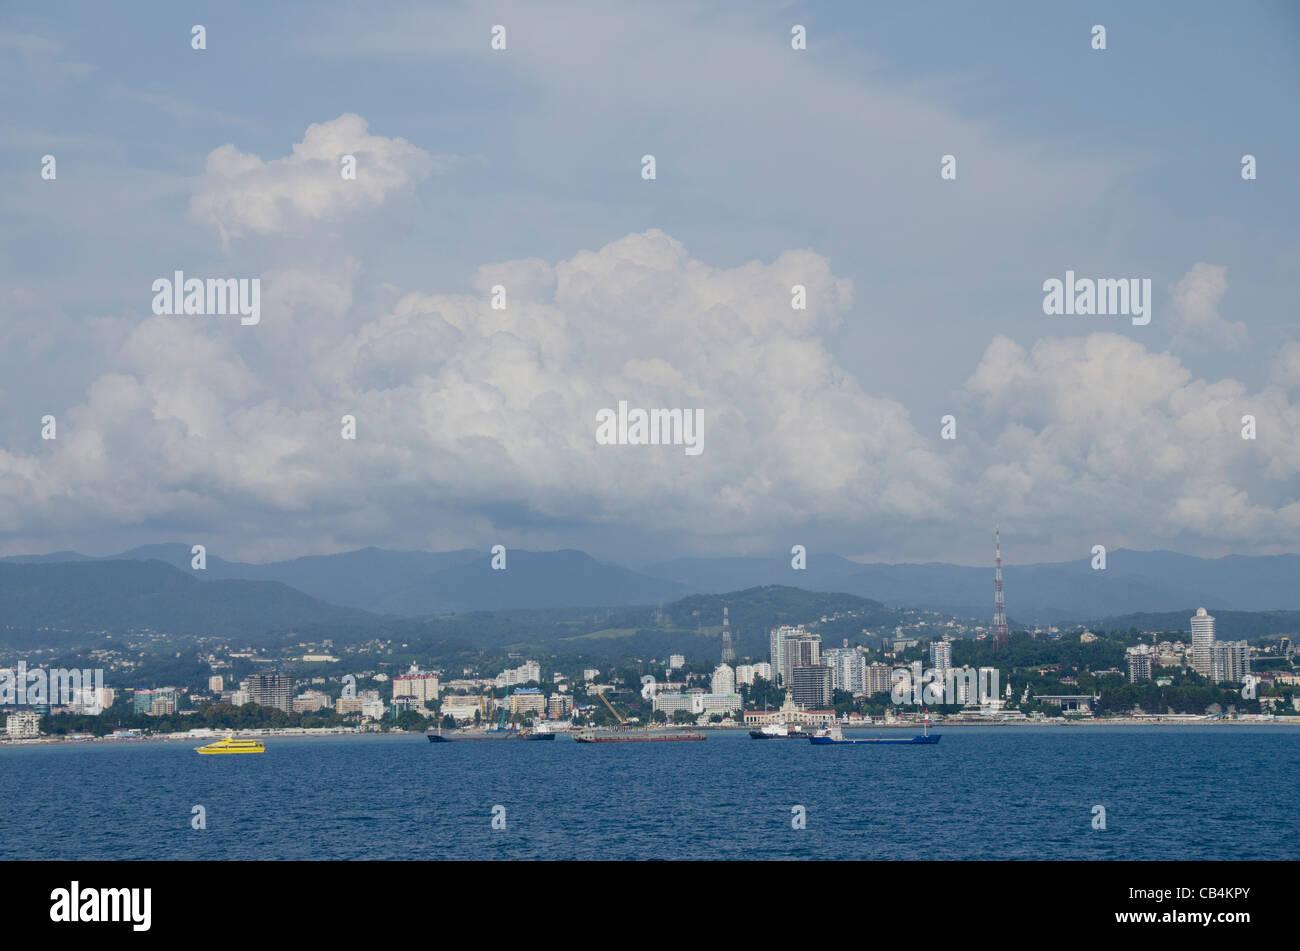 Russia, Sochi. Seaside port area along the Black Sea. - Stock Image